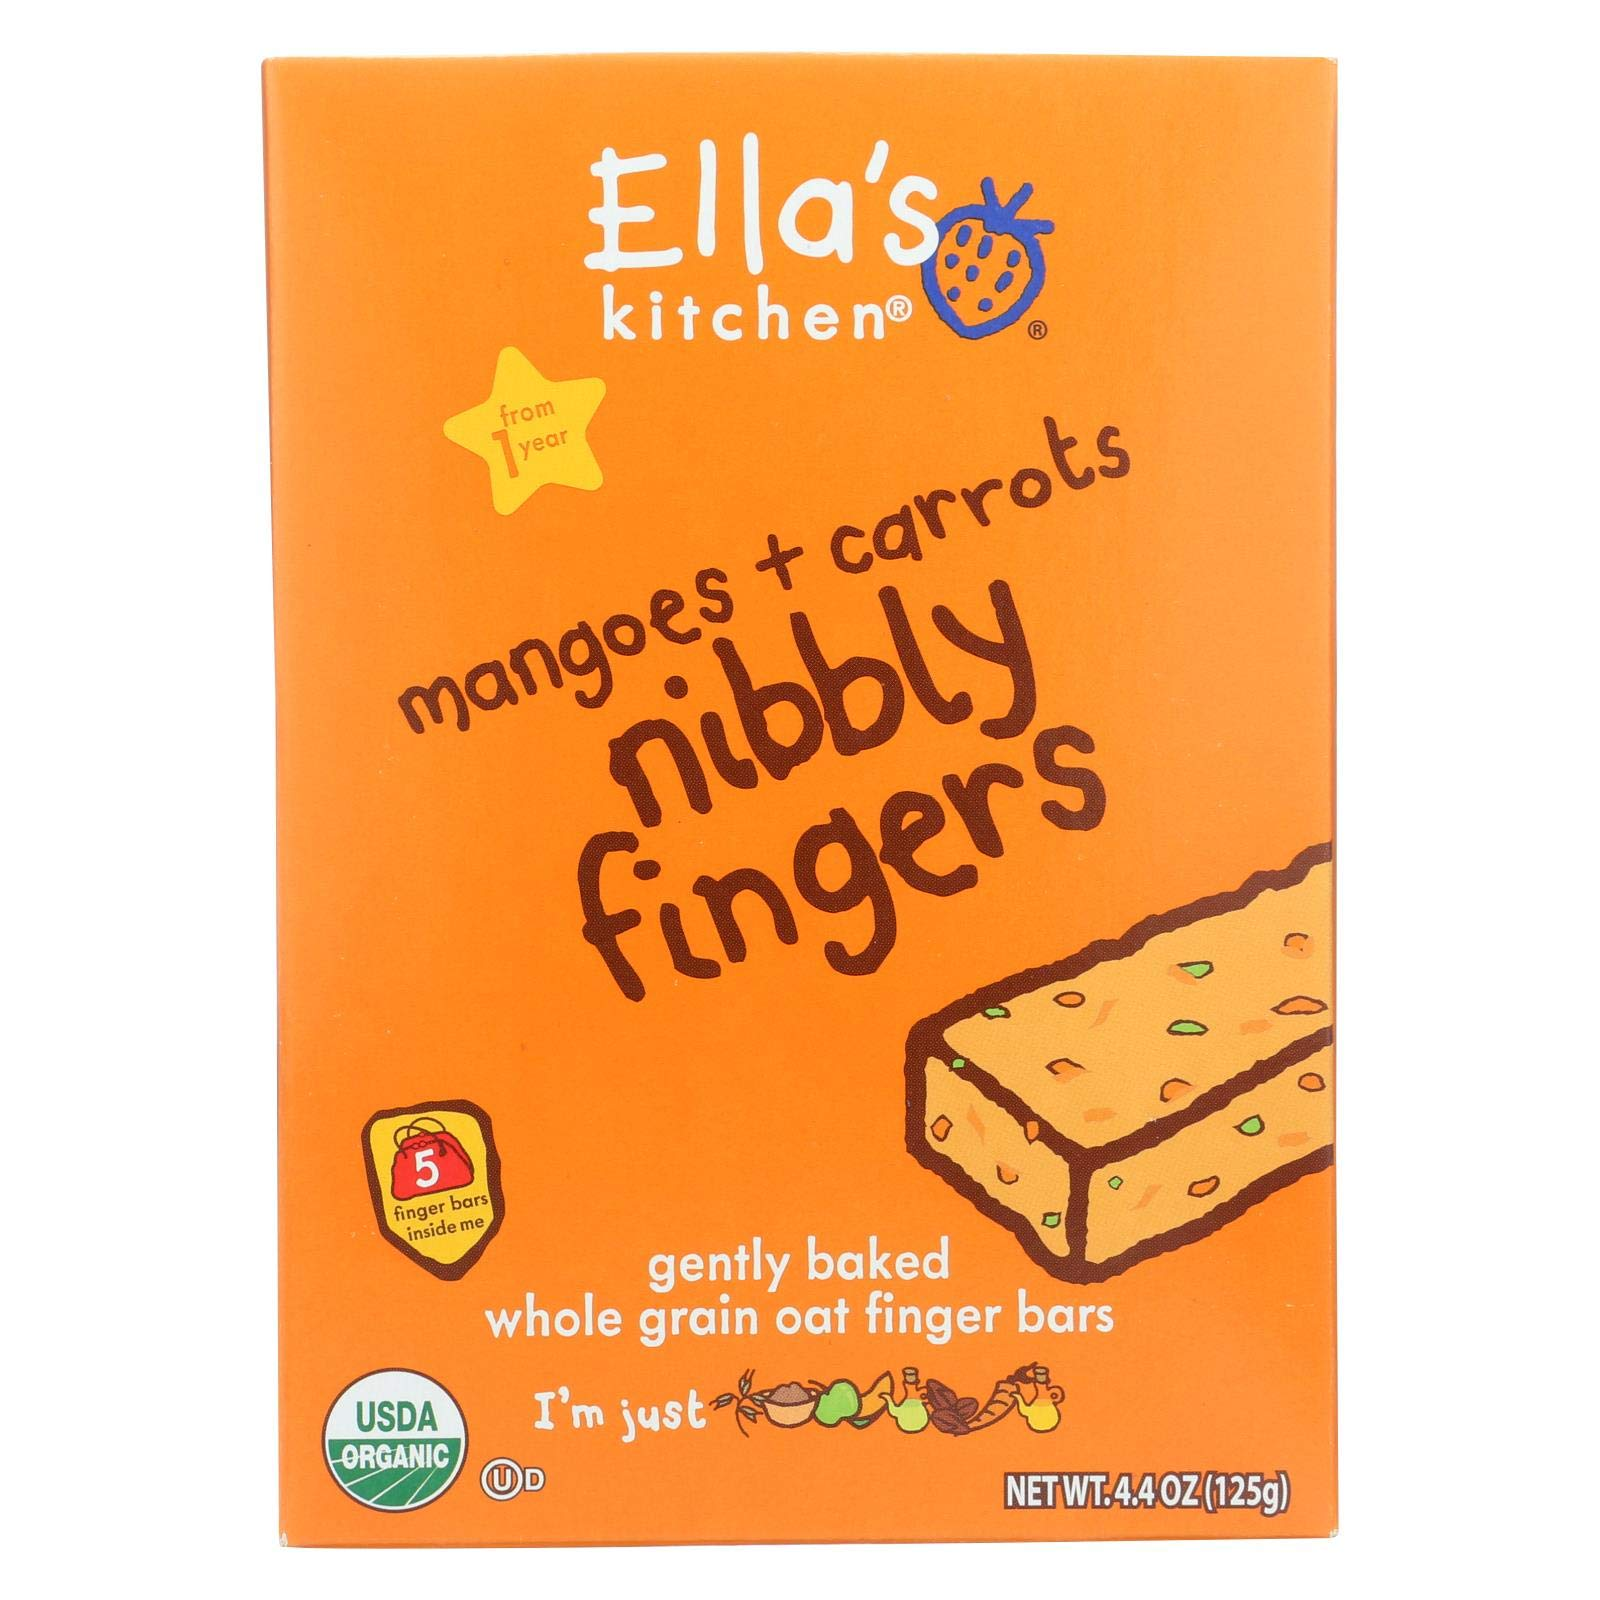 Ella's Kitchen Nibbly Fingers - Mangoes Carrots - Case of 12 - 4.4 oz.